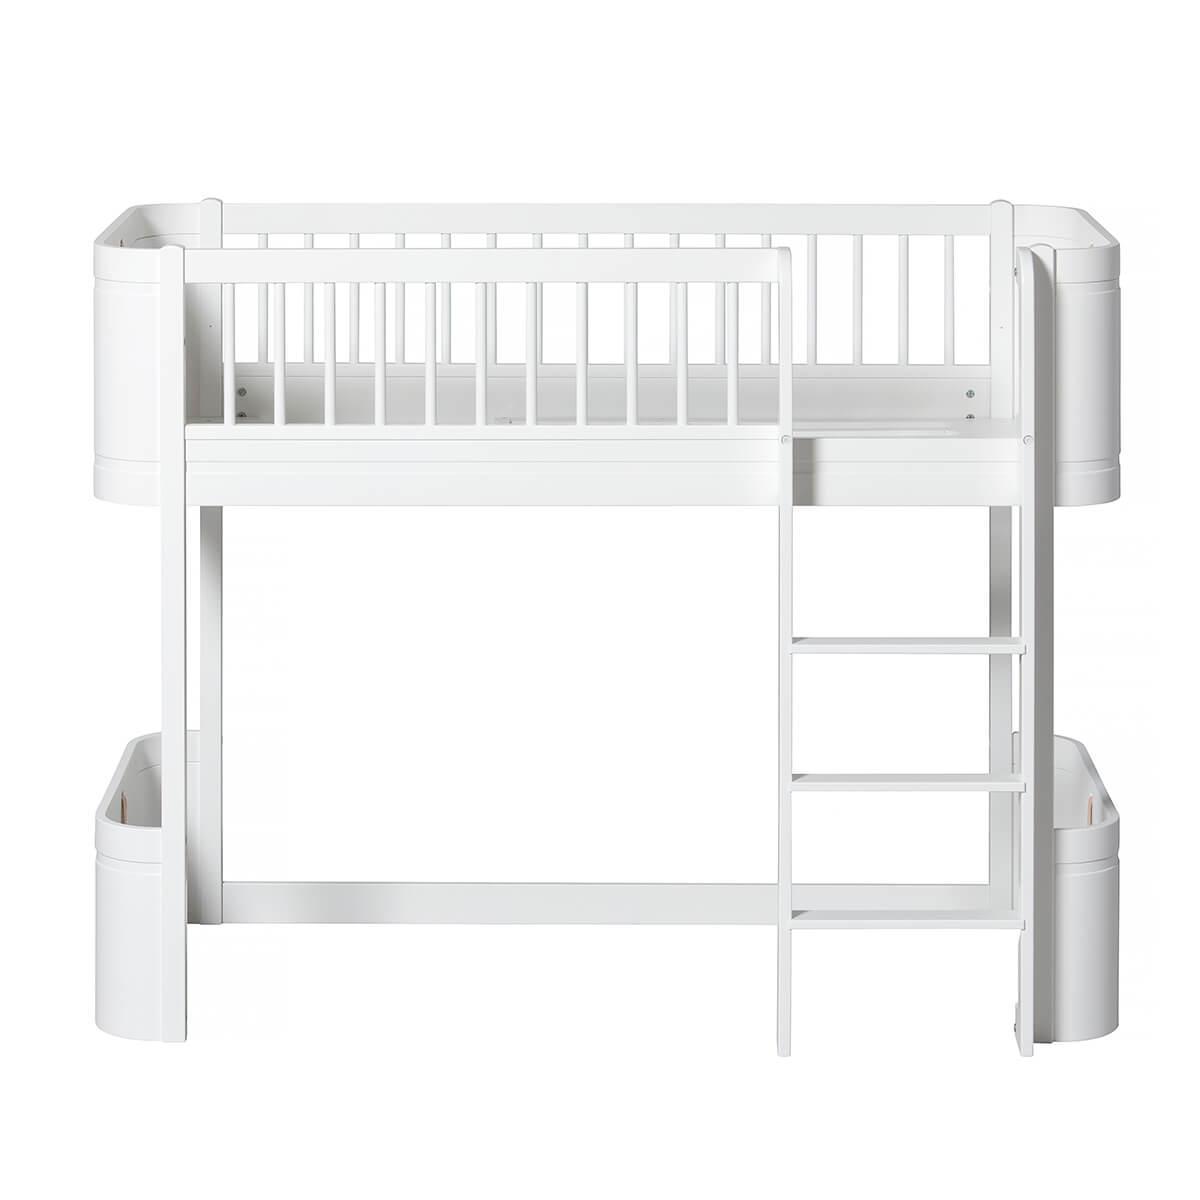 Cama evolutiva semi alta 68x162cm MINI+ WOOD Oliver Furniture blanco